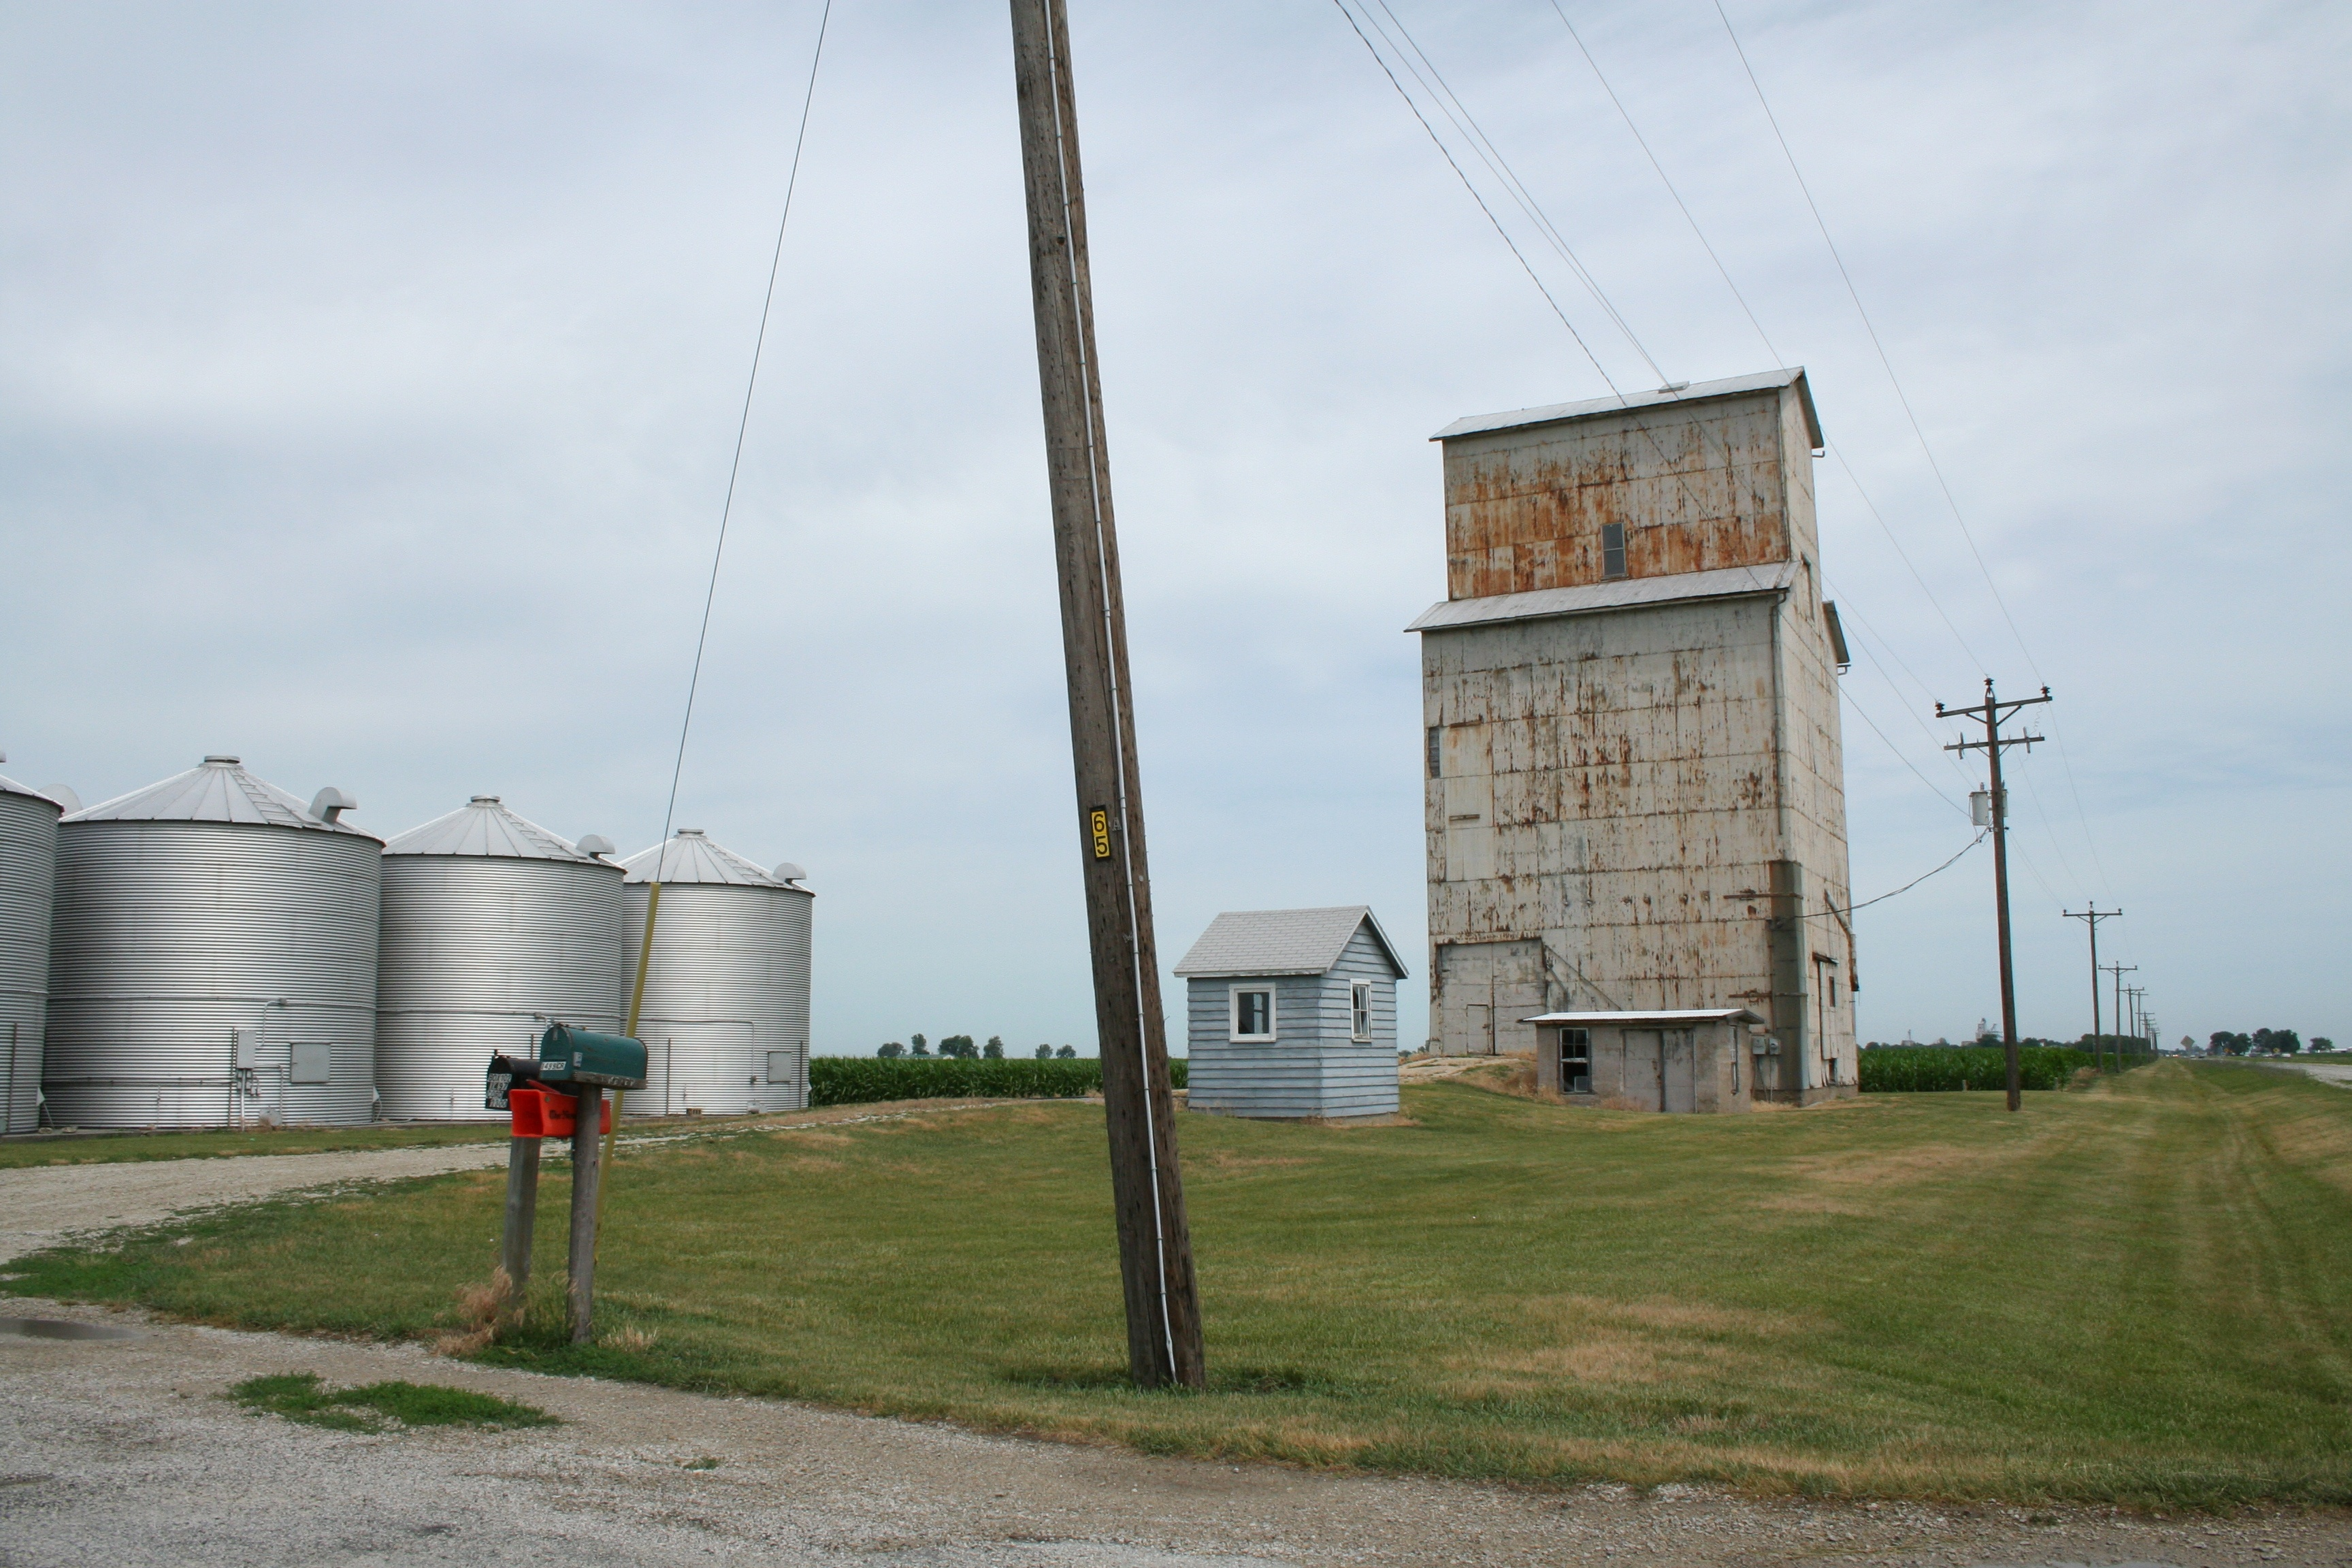 Illinois champaign county thomasboro - Illinois Champaign County Thomasboro 13